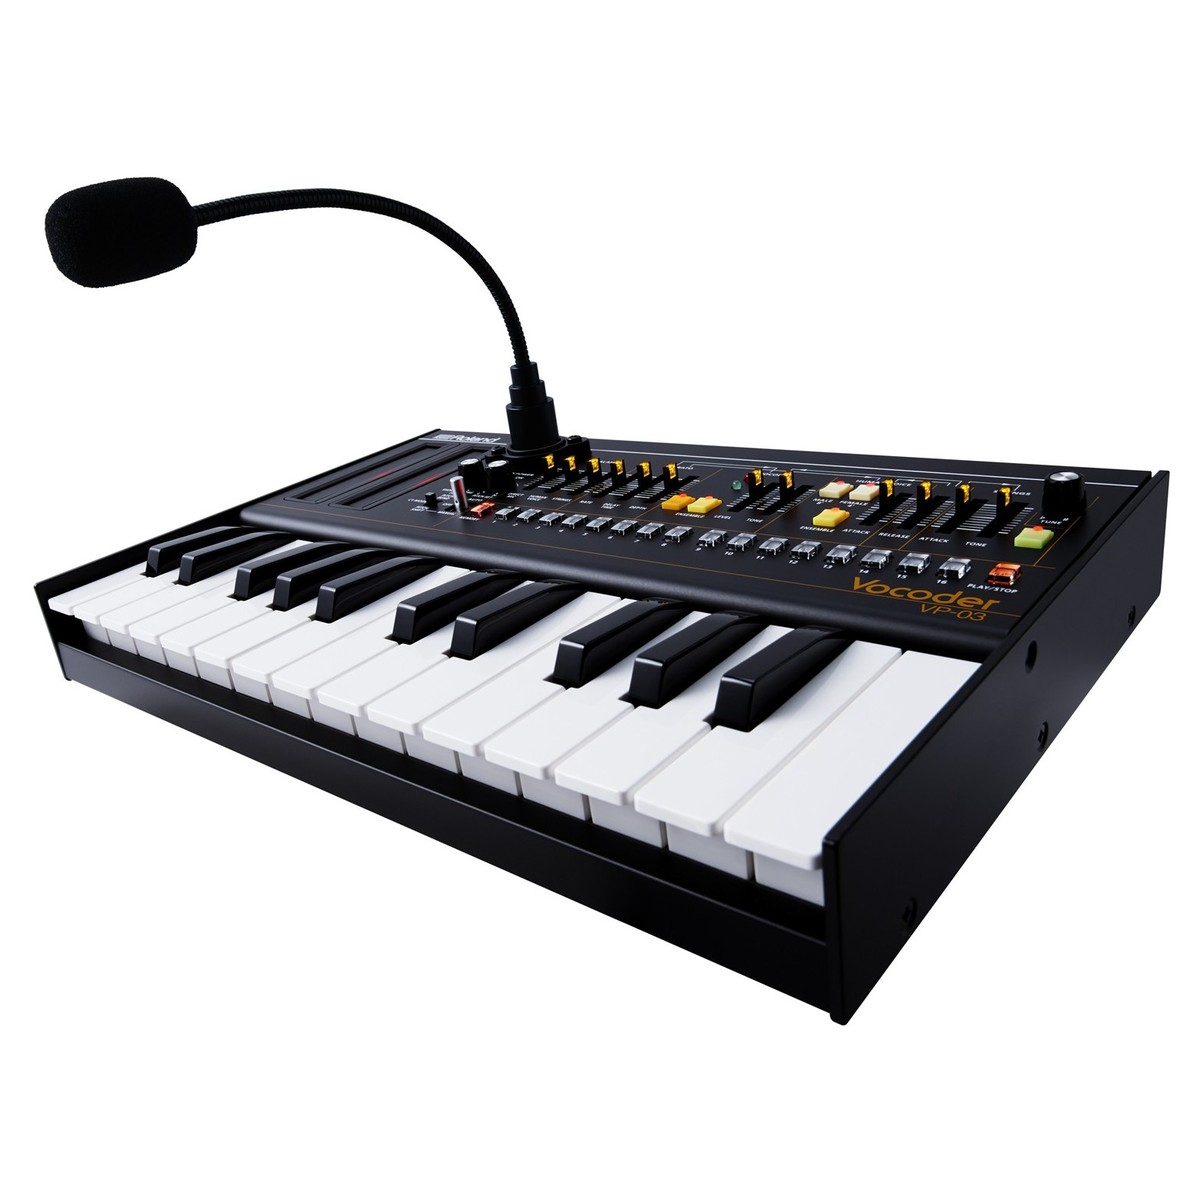 roland vp 03 module with k 25m keyboard at gear4music. Black Bedroom Furniture Sets. Home Design Ideas